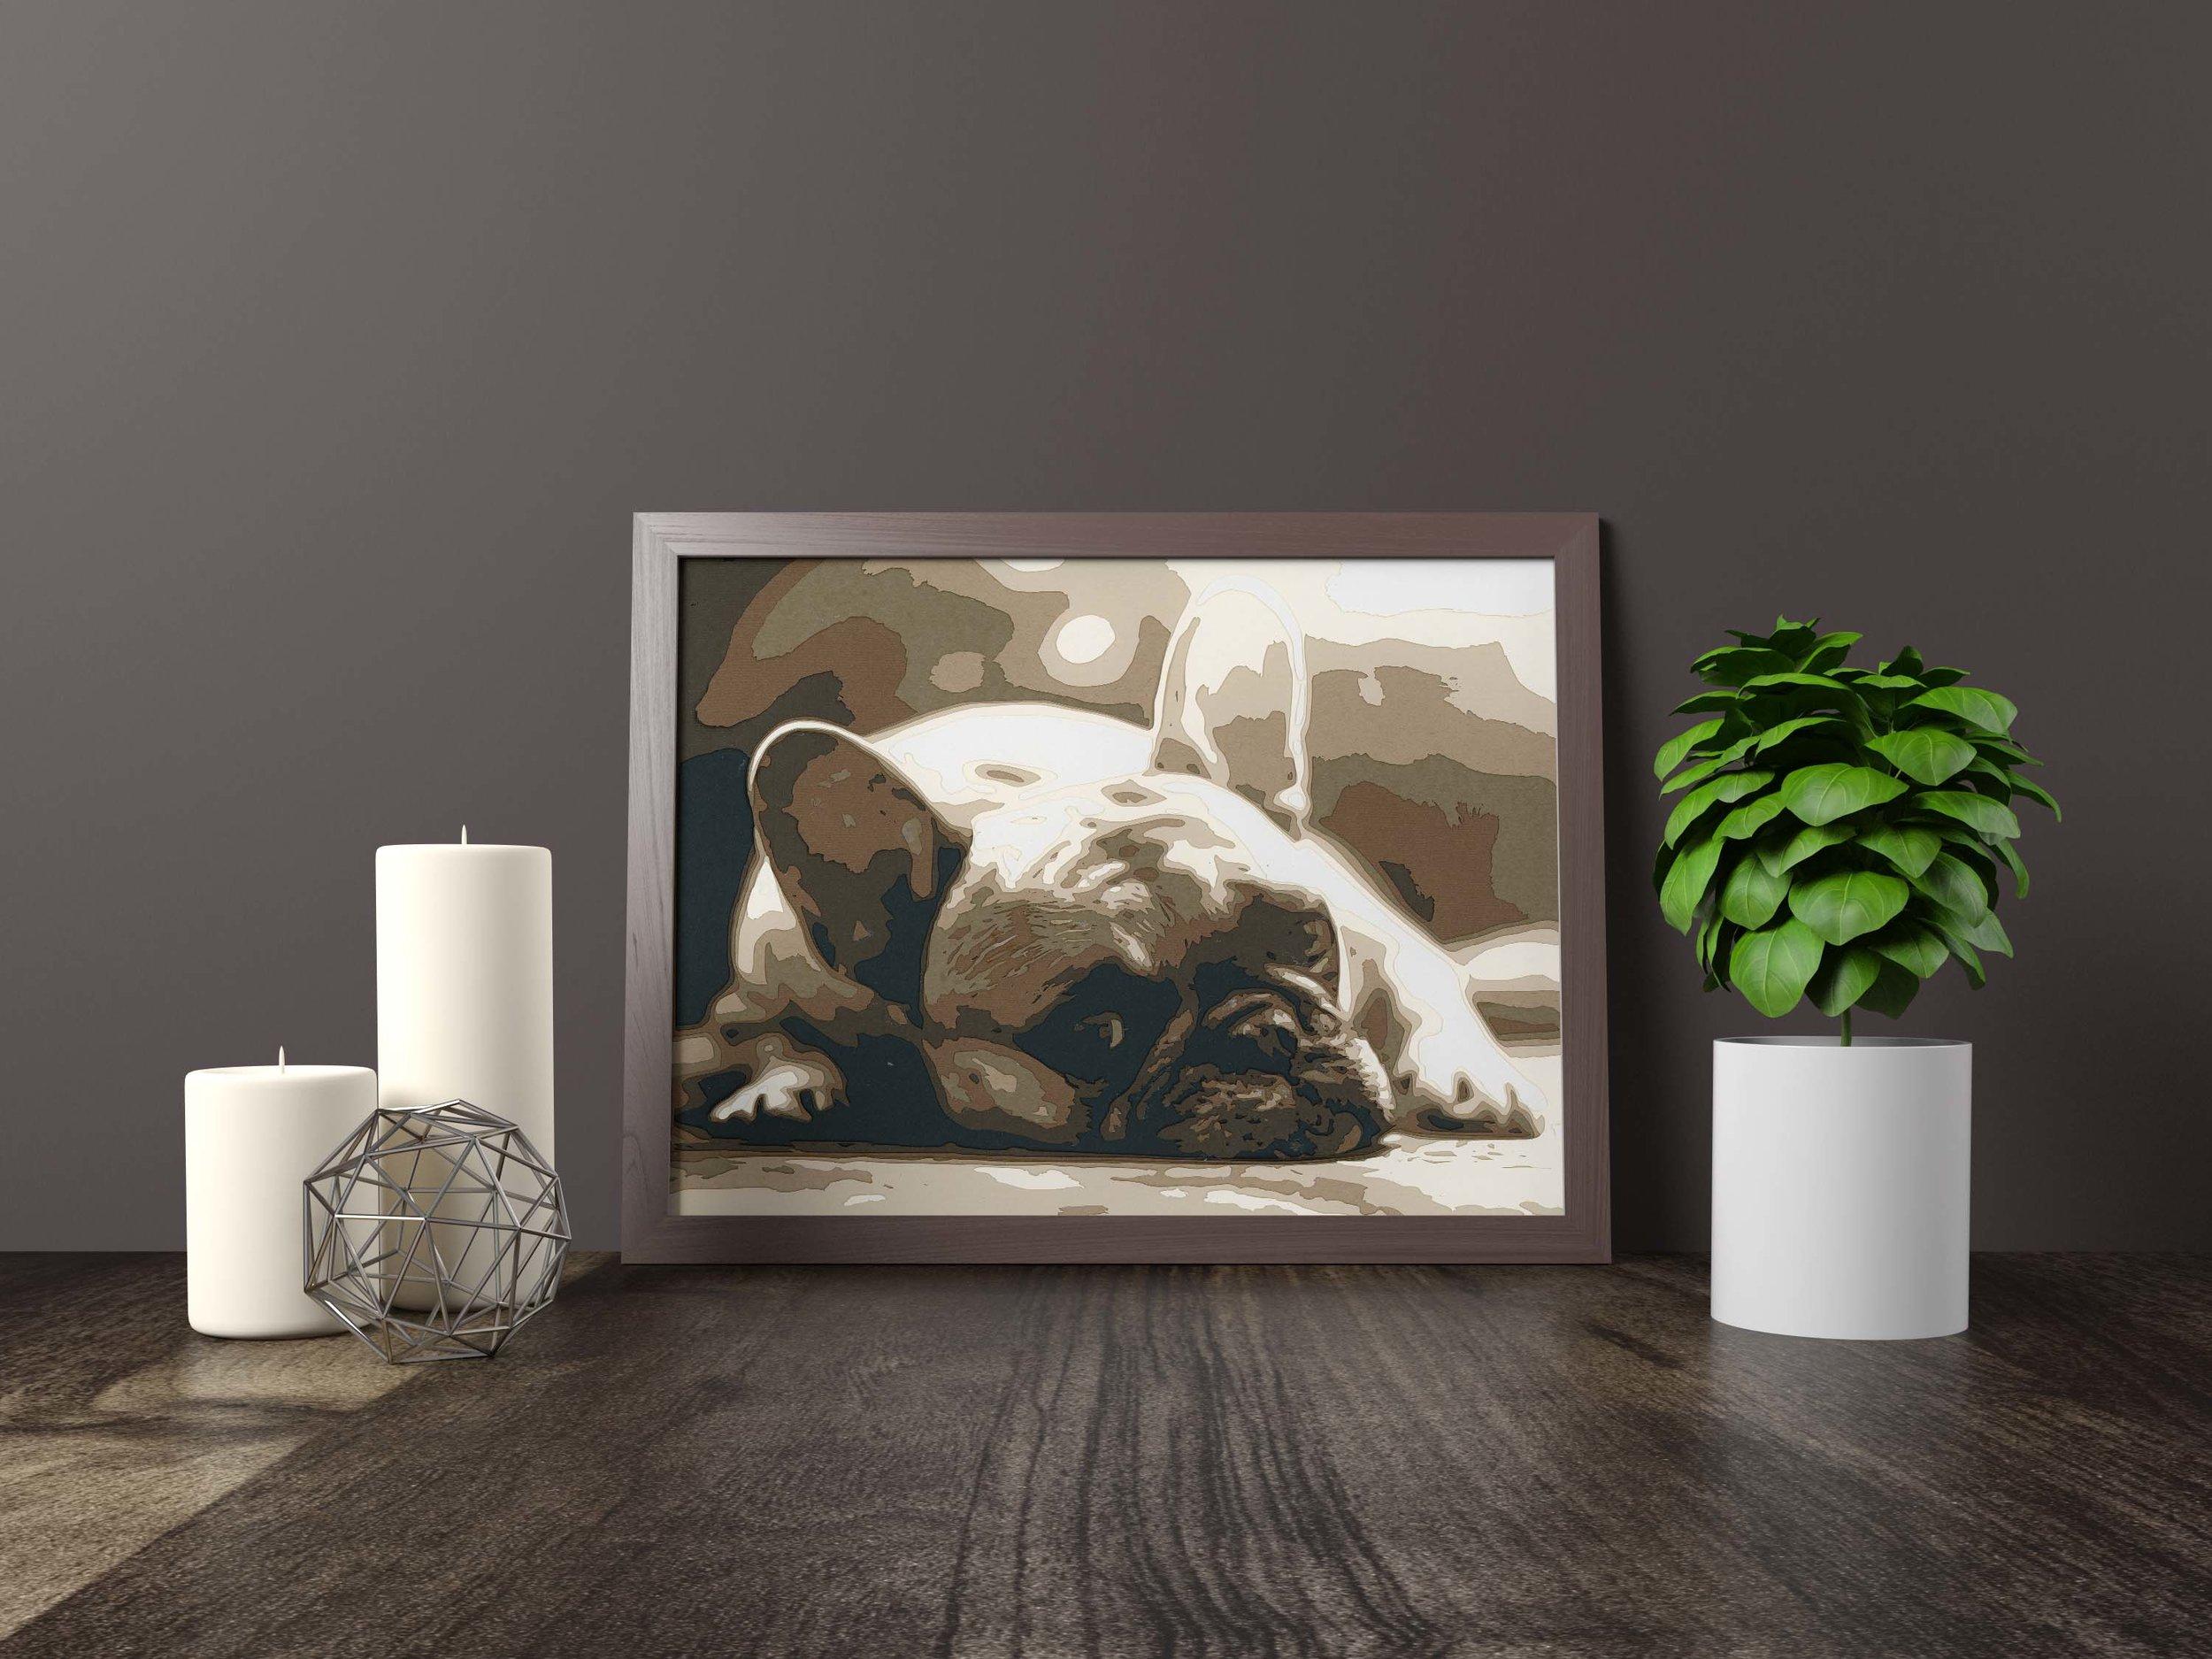 frenchie - french bulldog - Original Artwork *FOR SALE* 11